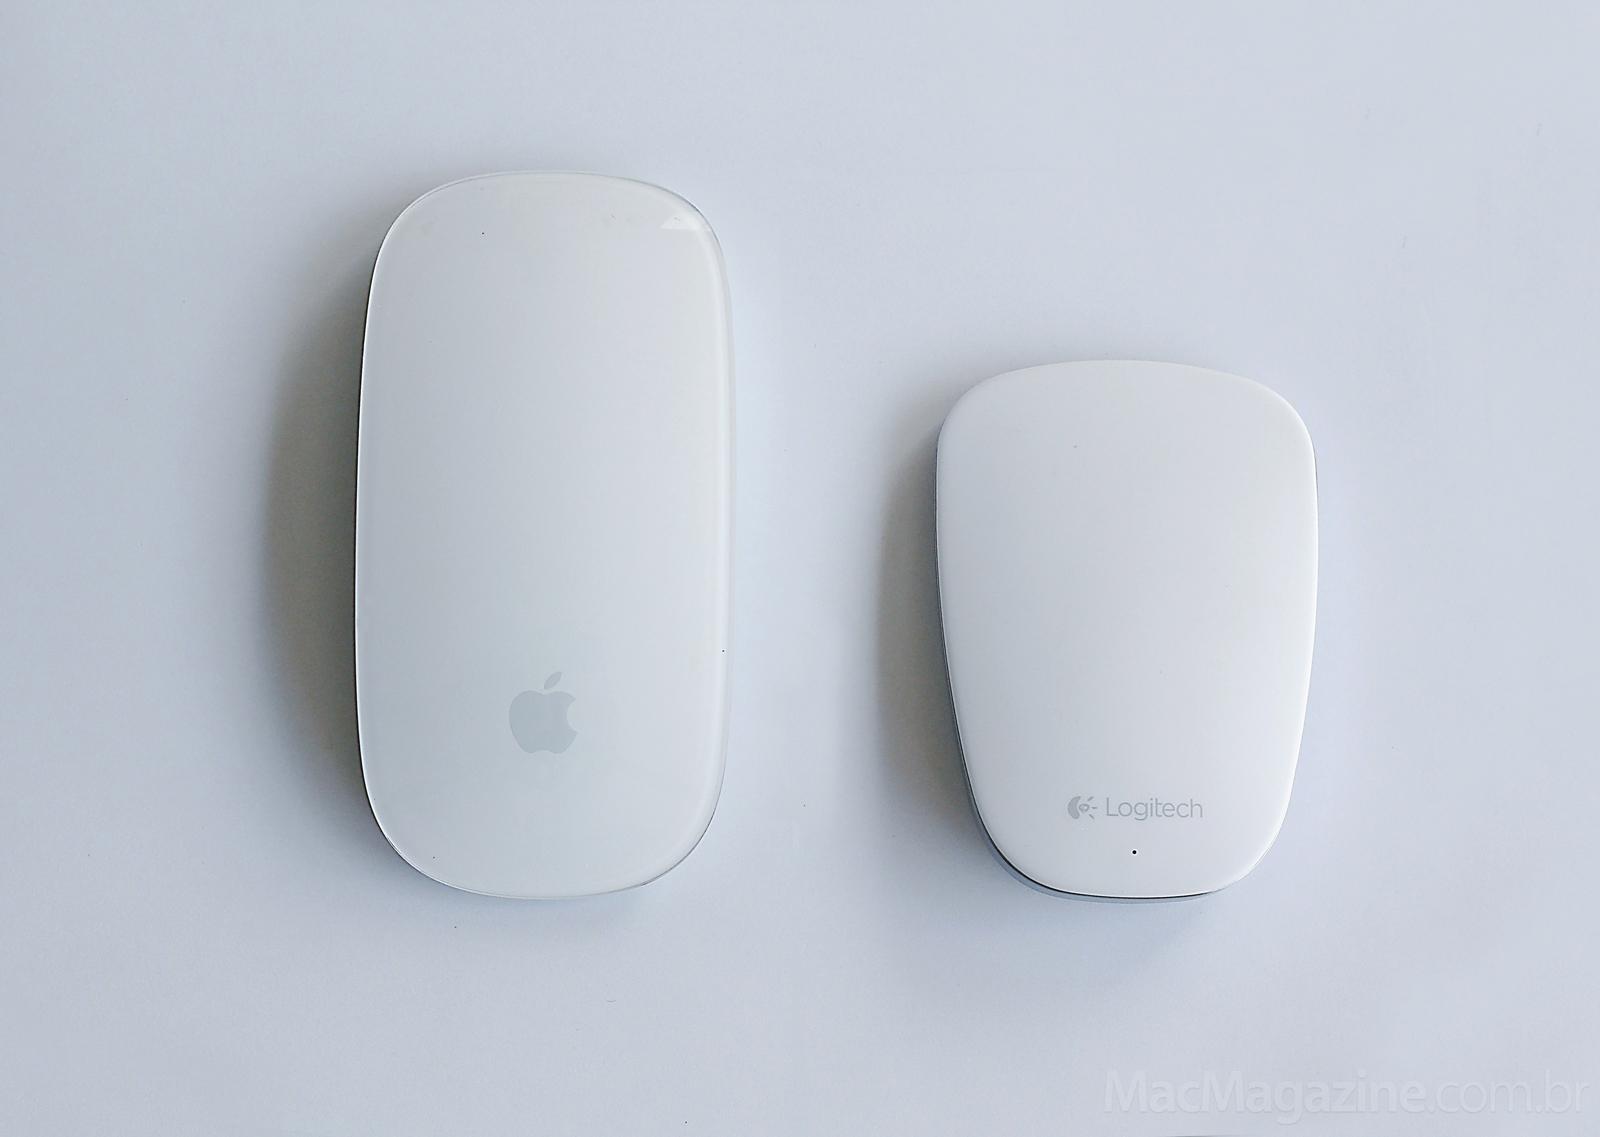 Logitech Ultrathin Touch Mouse T631